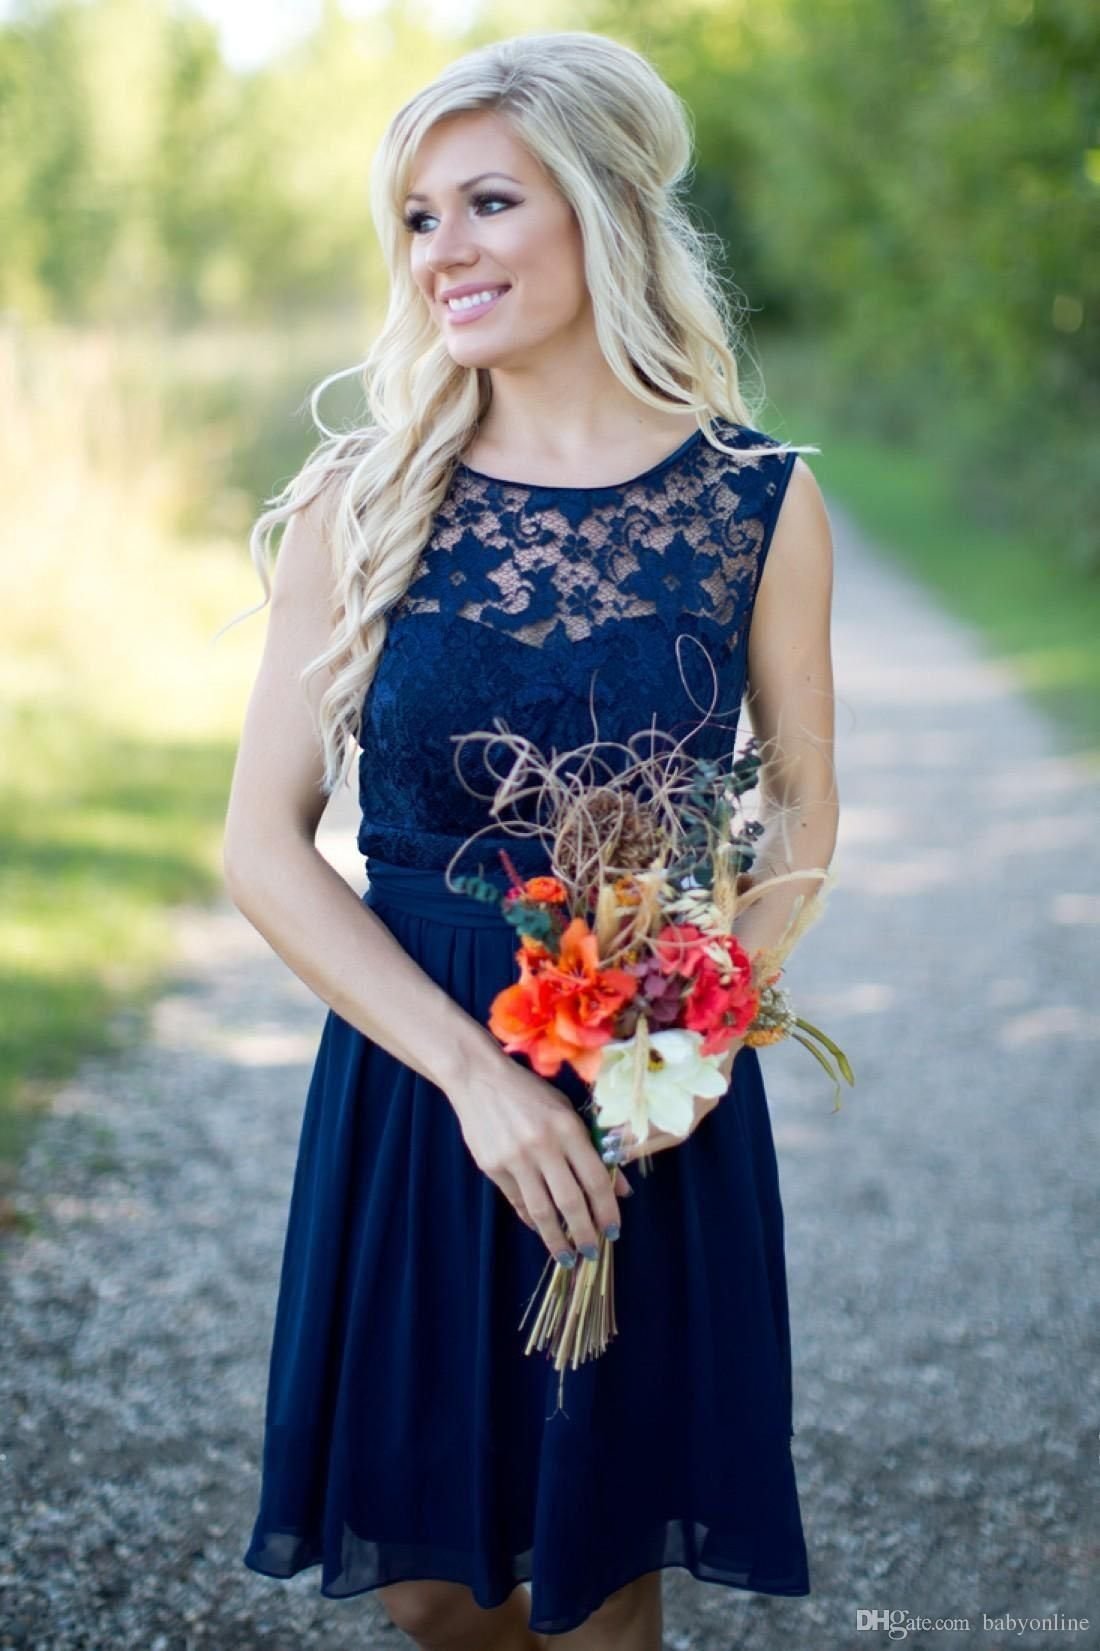 Midnight blue bridesmaid dresses uk gallery braidsmaid dress blue bridesmaids dresses cheap wedding dress pinterest blue bridesmaids dresses cheap ombrellifo gallery ombrellifo Images